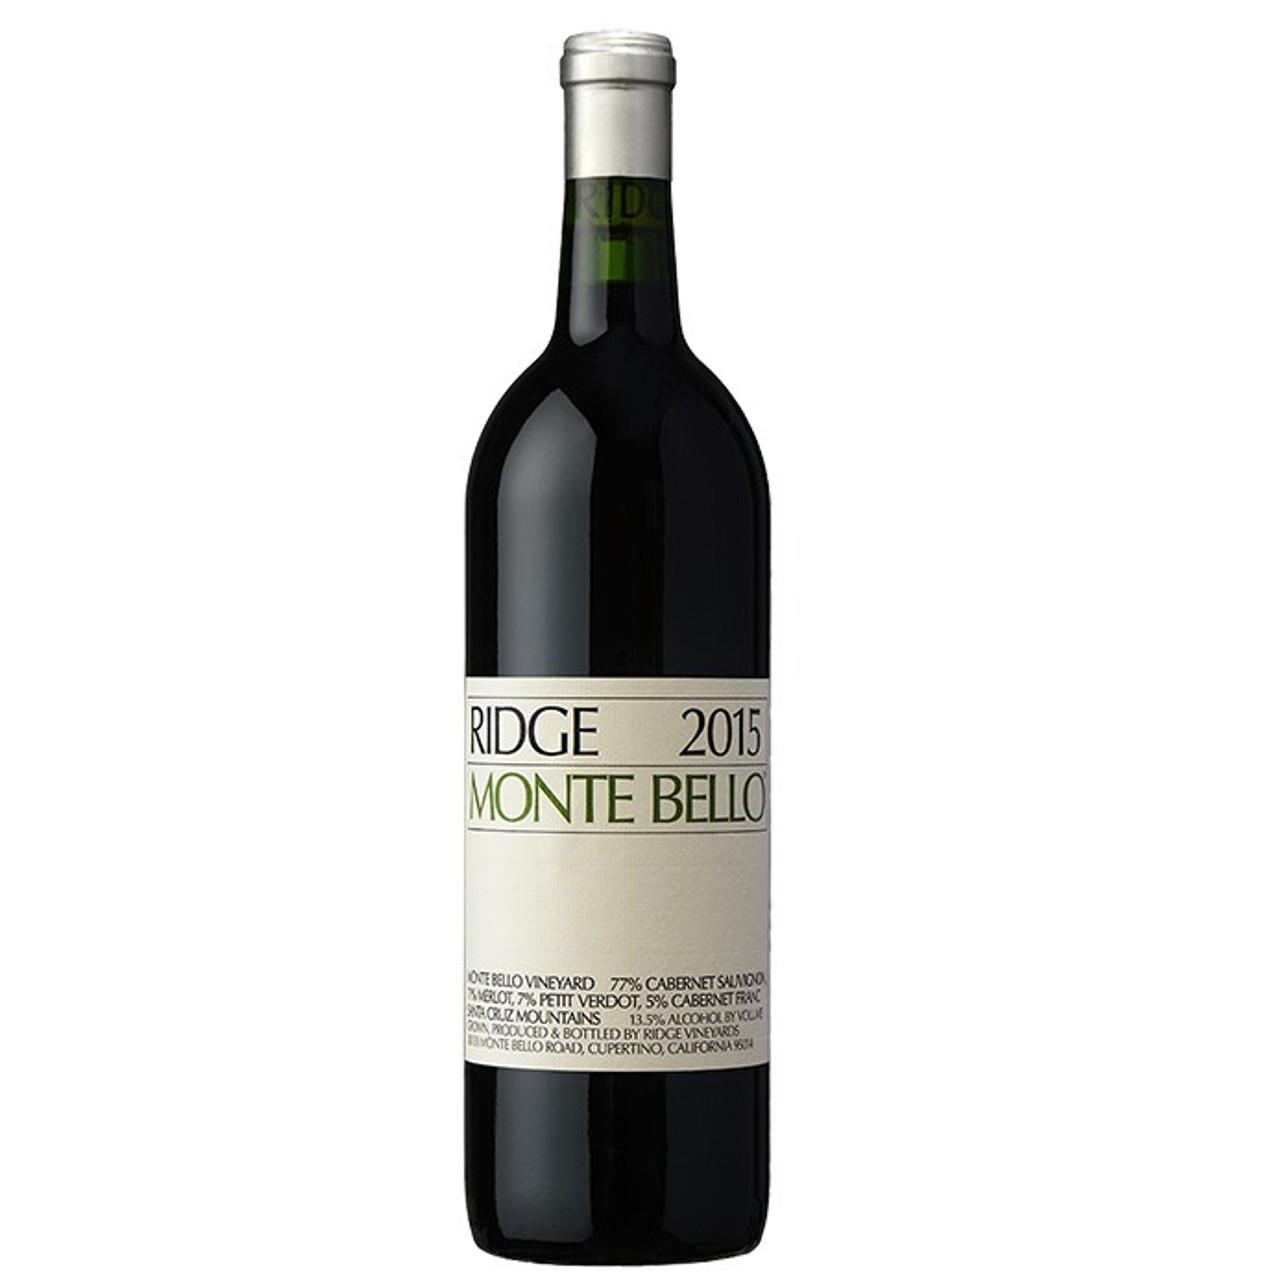 Ridge Monte Bello 2015